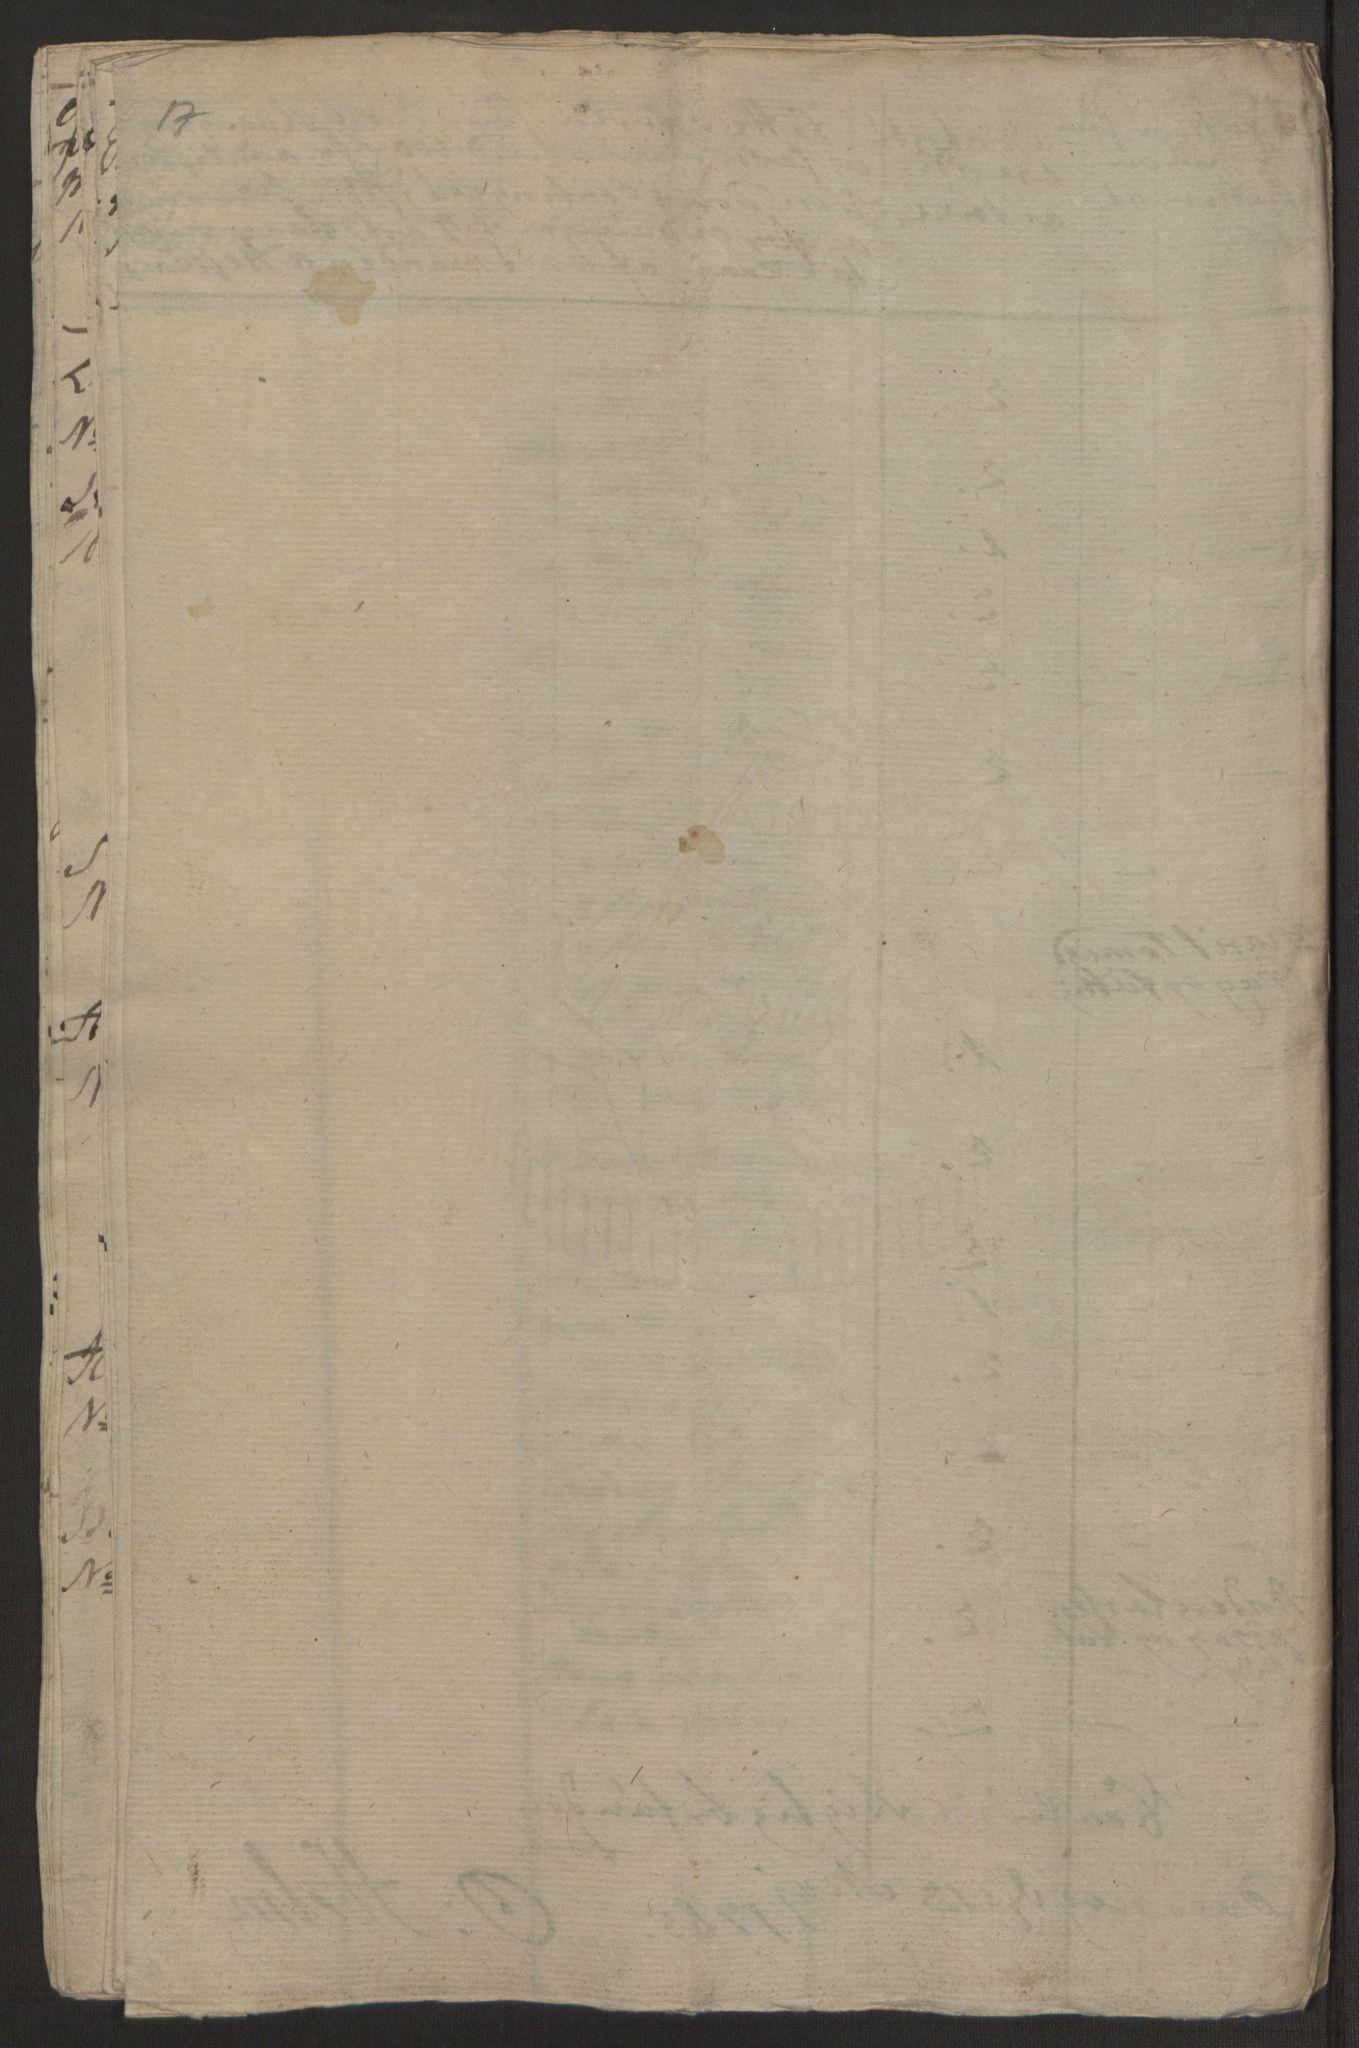 RA, Rentekammeret inntil 1814, Realistisk ordnet avdeling, Ol/L0022a: [Gg 10]: Ekstraskatten, 23.09.1762. Nordlands amt, 1763-1769, s. 158